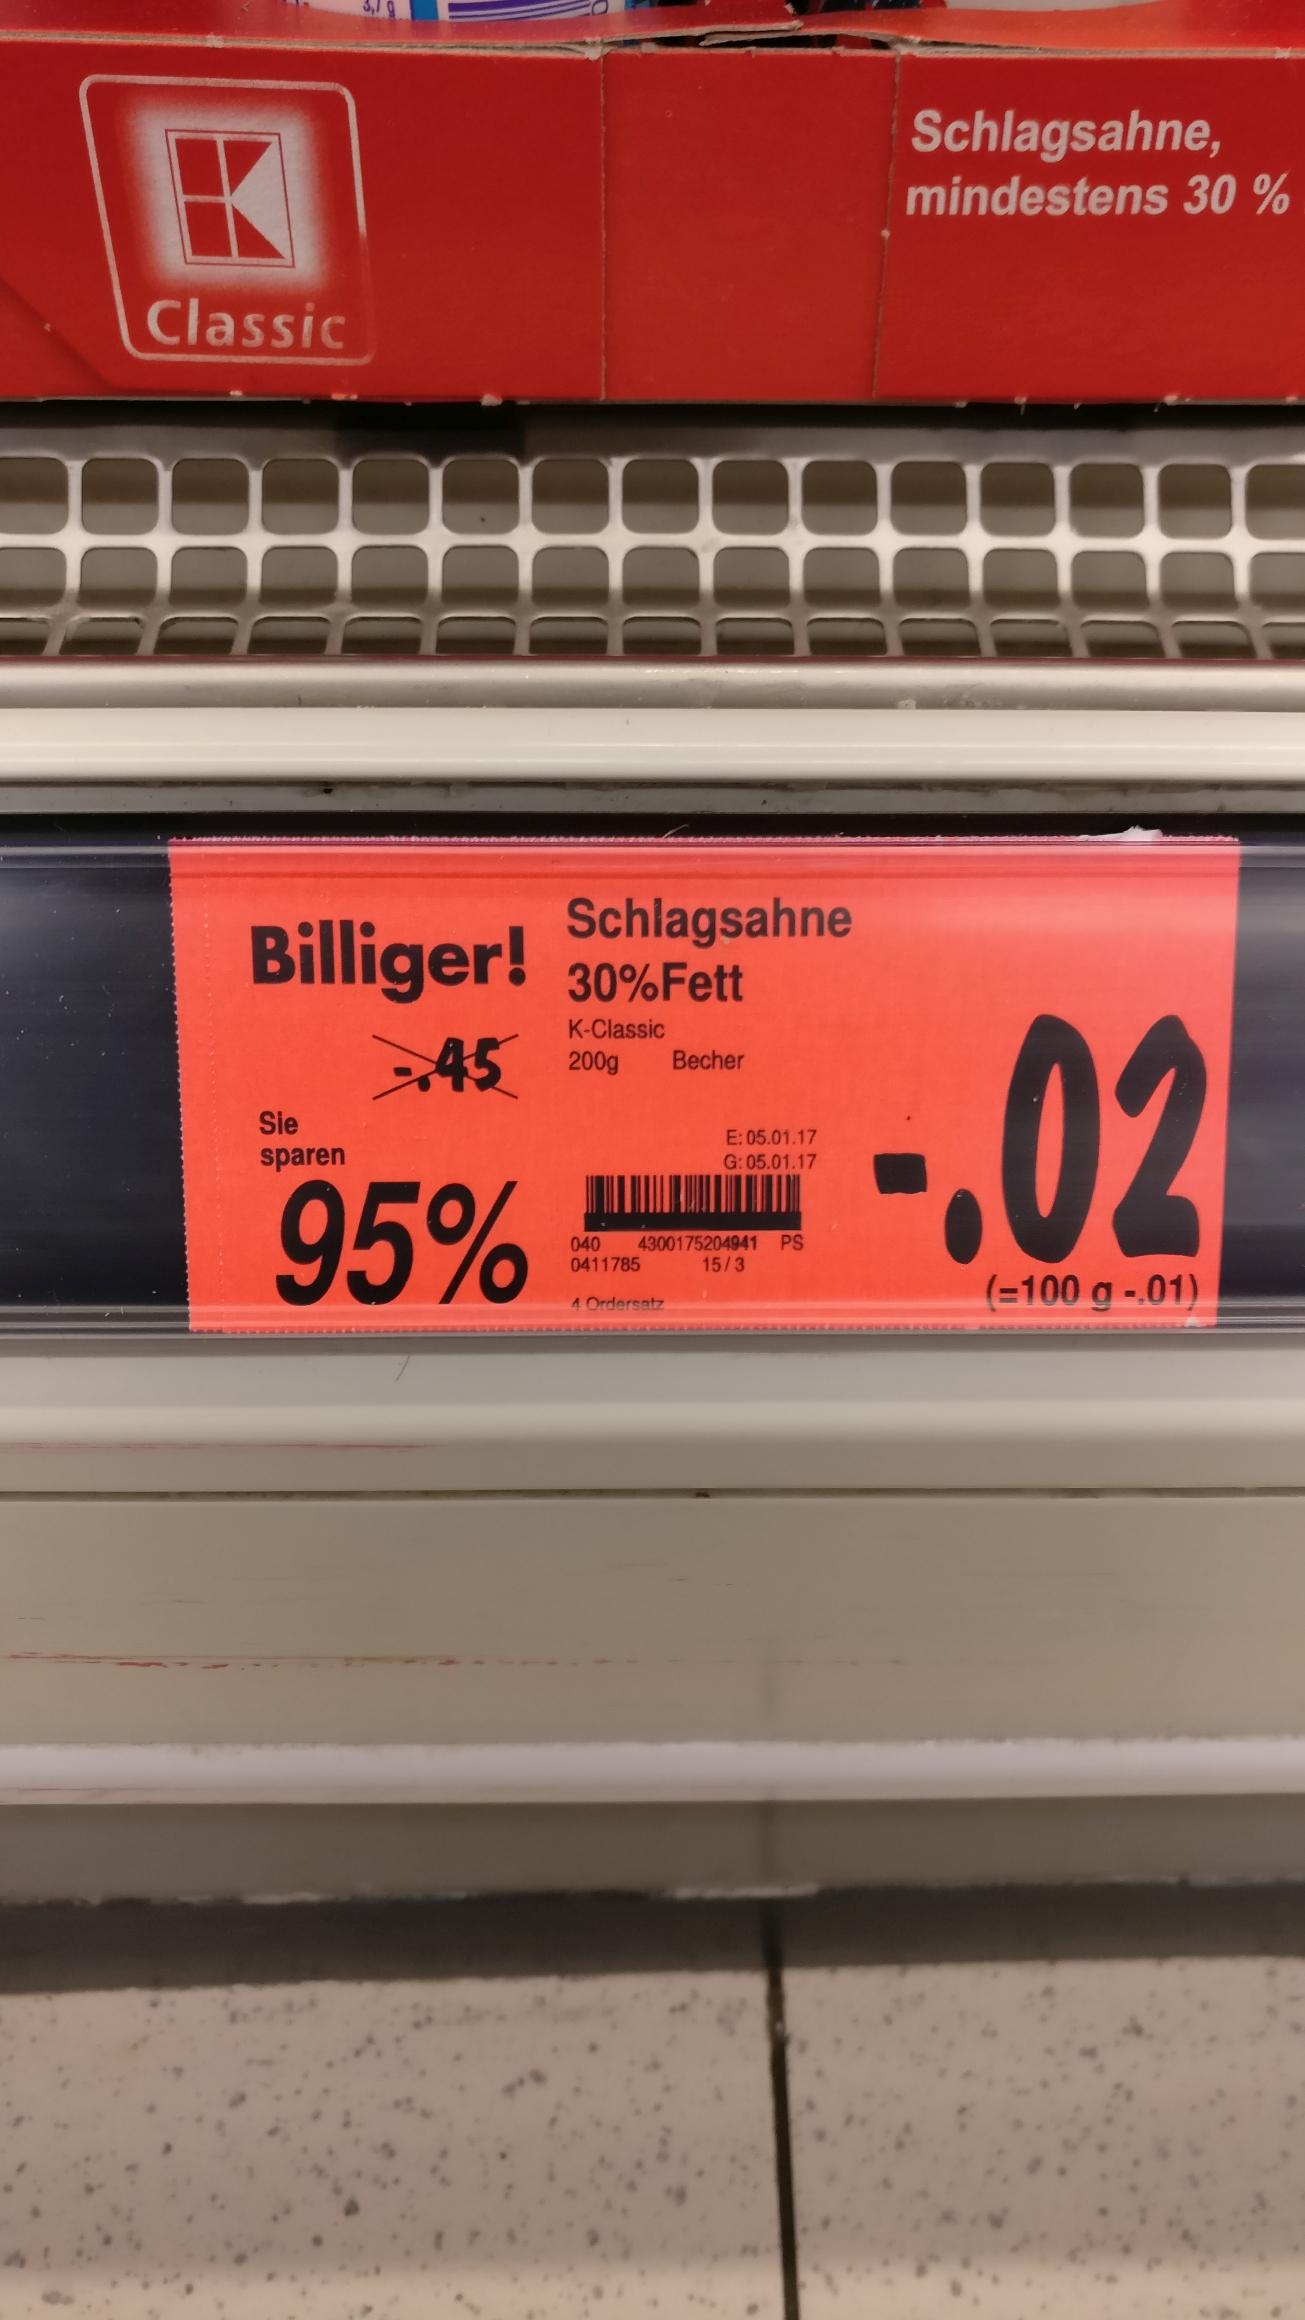 [Lokal Kaufland 33378] Schlagsahne 30% Fett 200 ml (MHD 7.1.) 0,02 € & Sagrotan 50 ml Desinfektionsspray 0,05 €